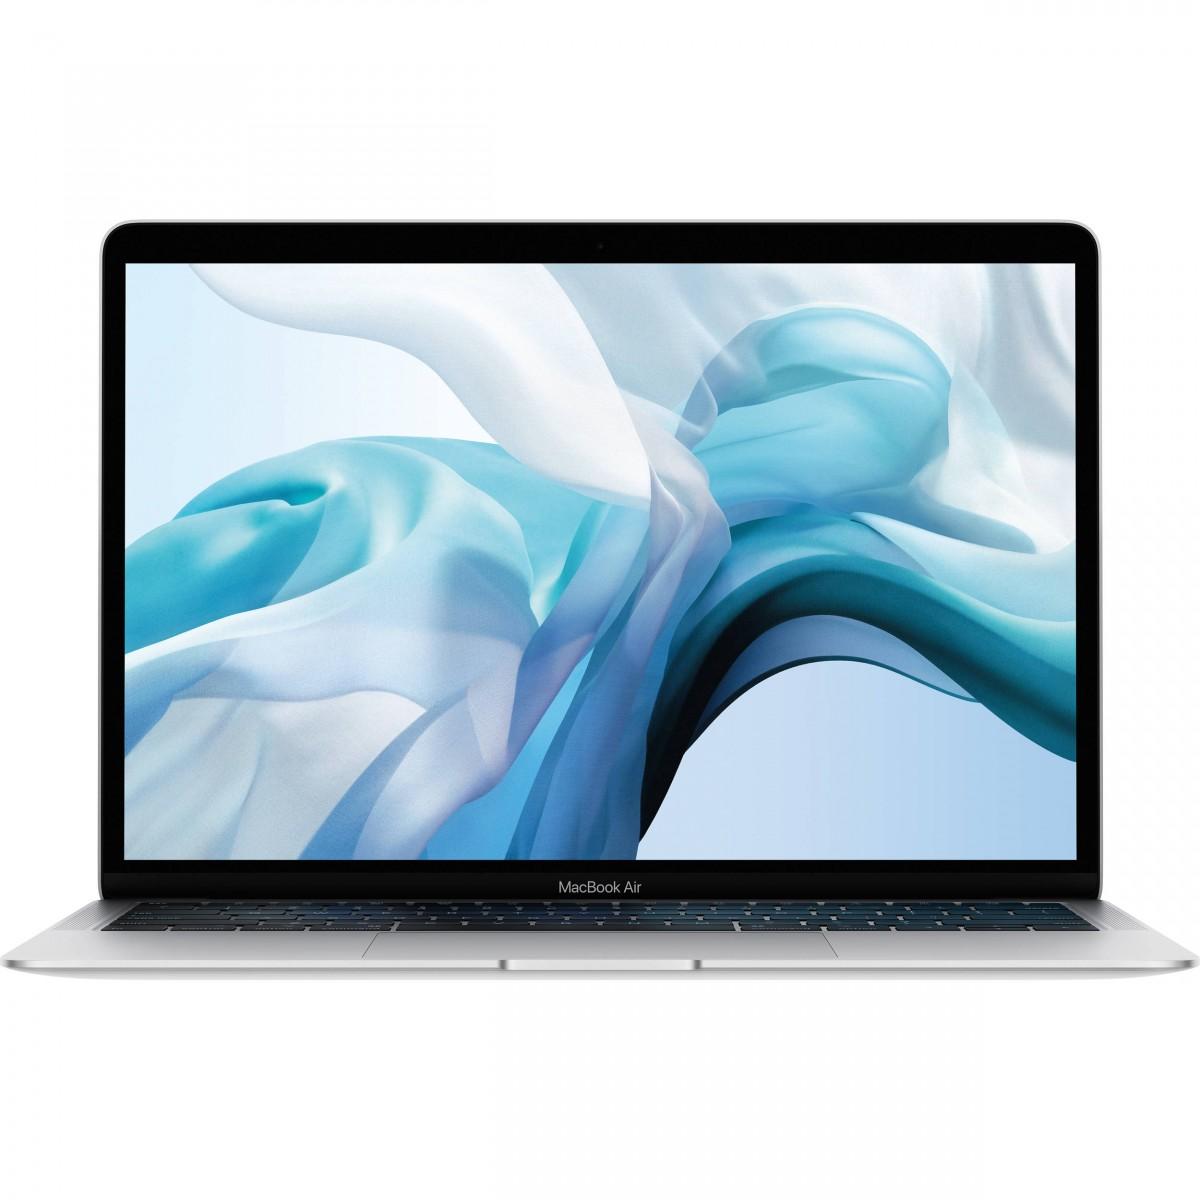 Apple MacBook Air 2018 MREC2CZ/A